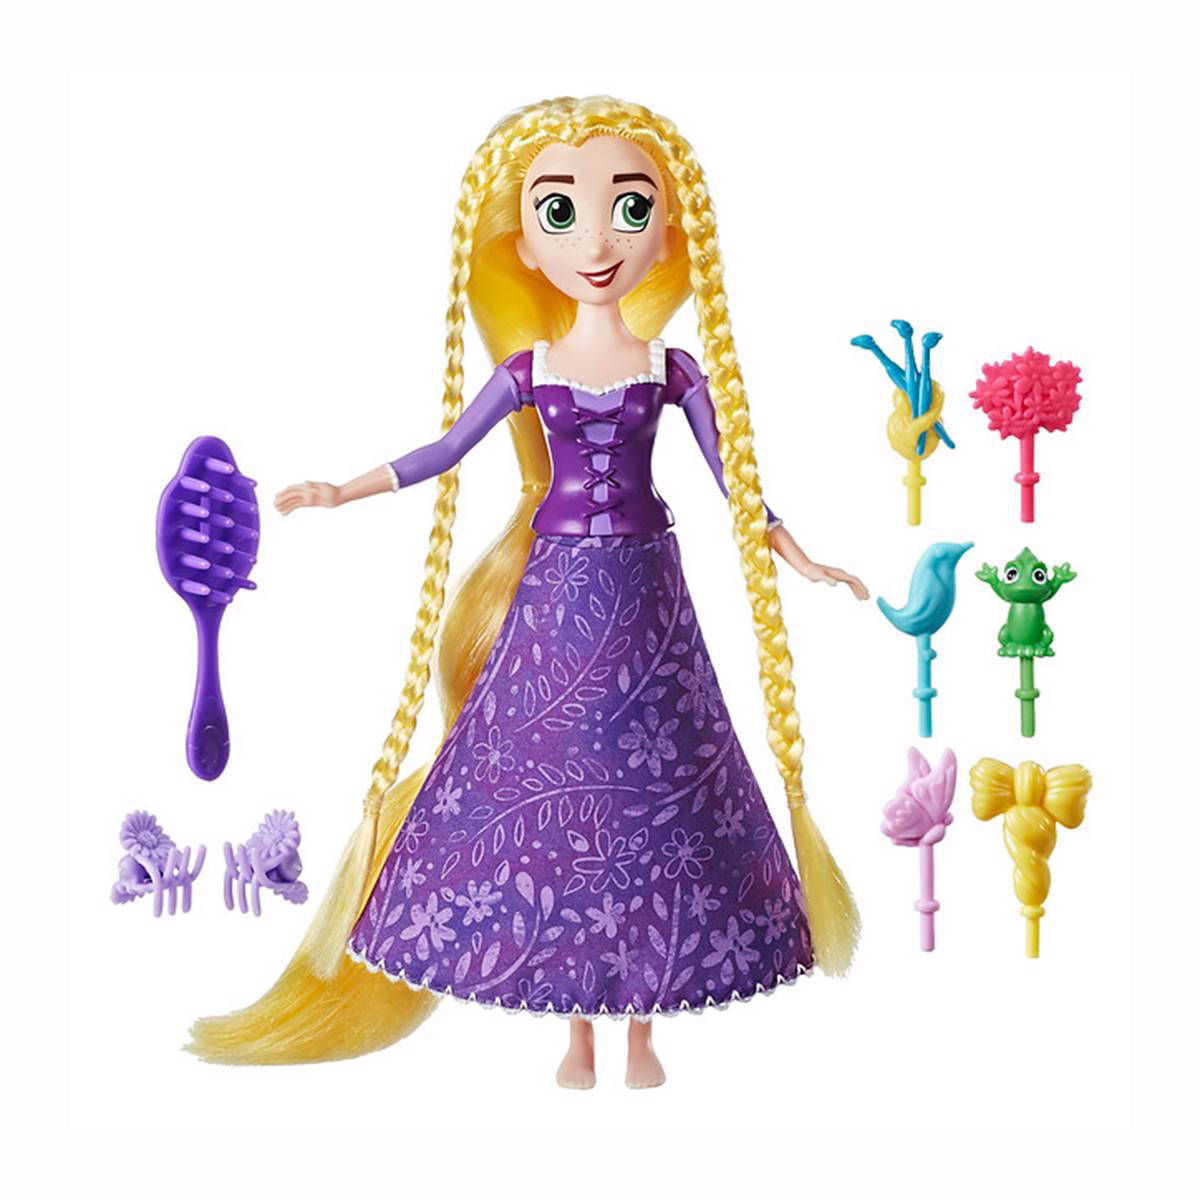 Rapunzel spin en stijl